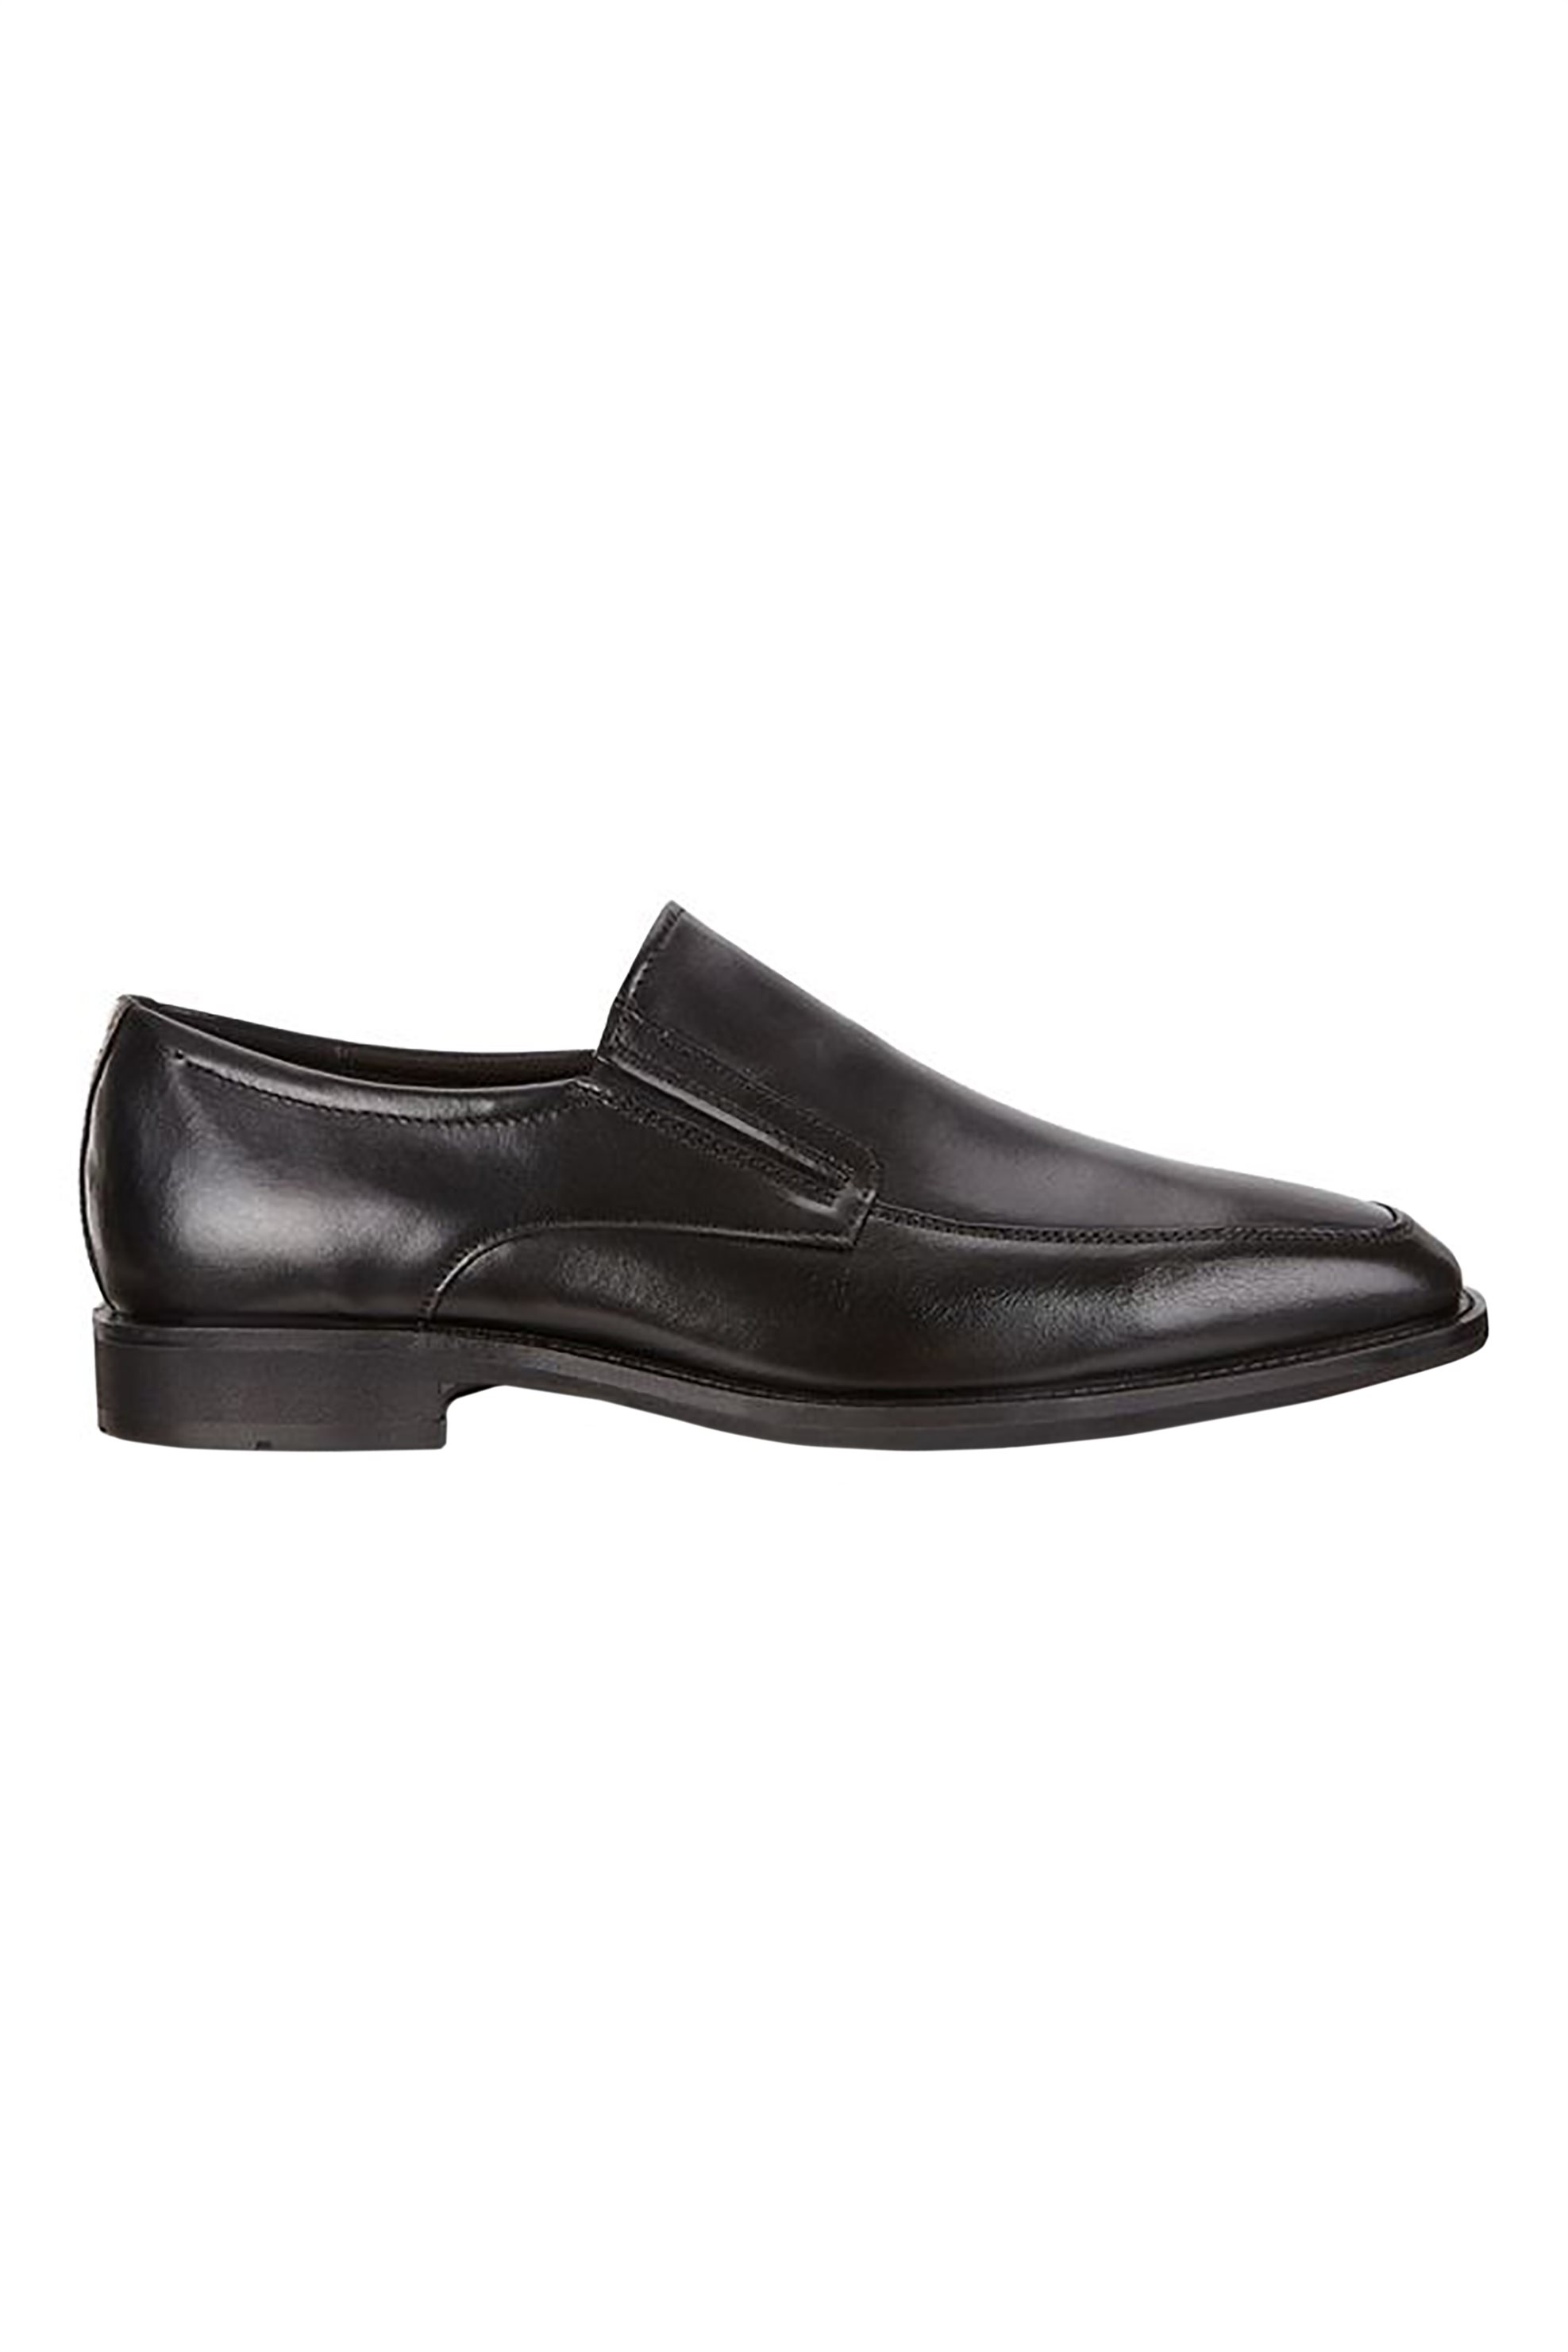 "ECCO ανδρικά δερμάτινα loafers ""Calcan"" – 989-640734 01001 – Μαύρο"